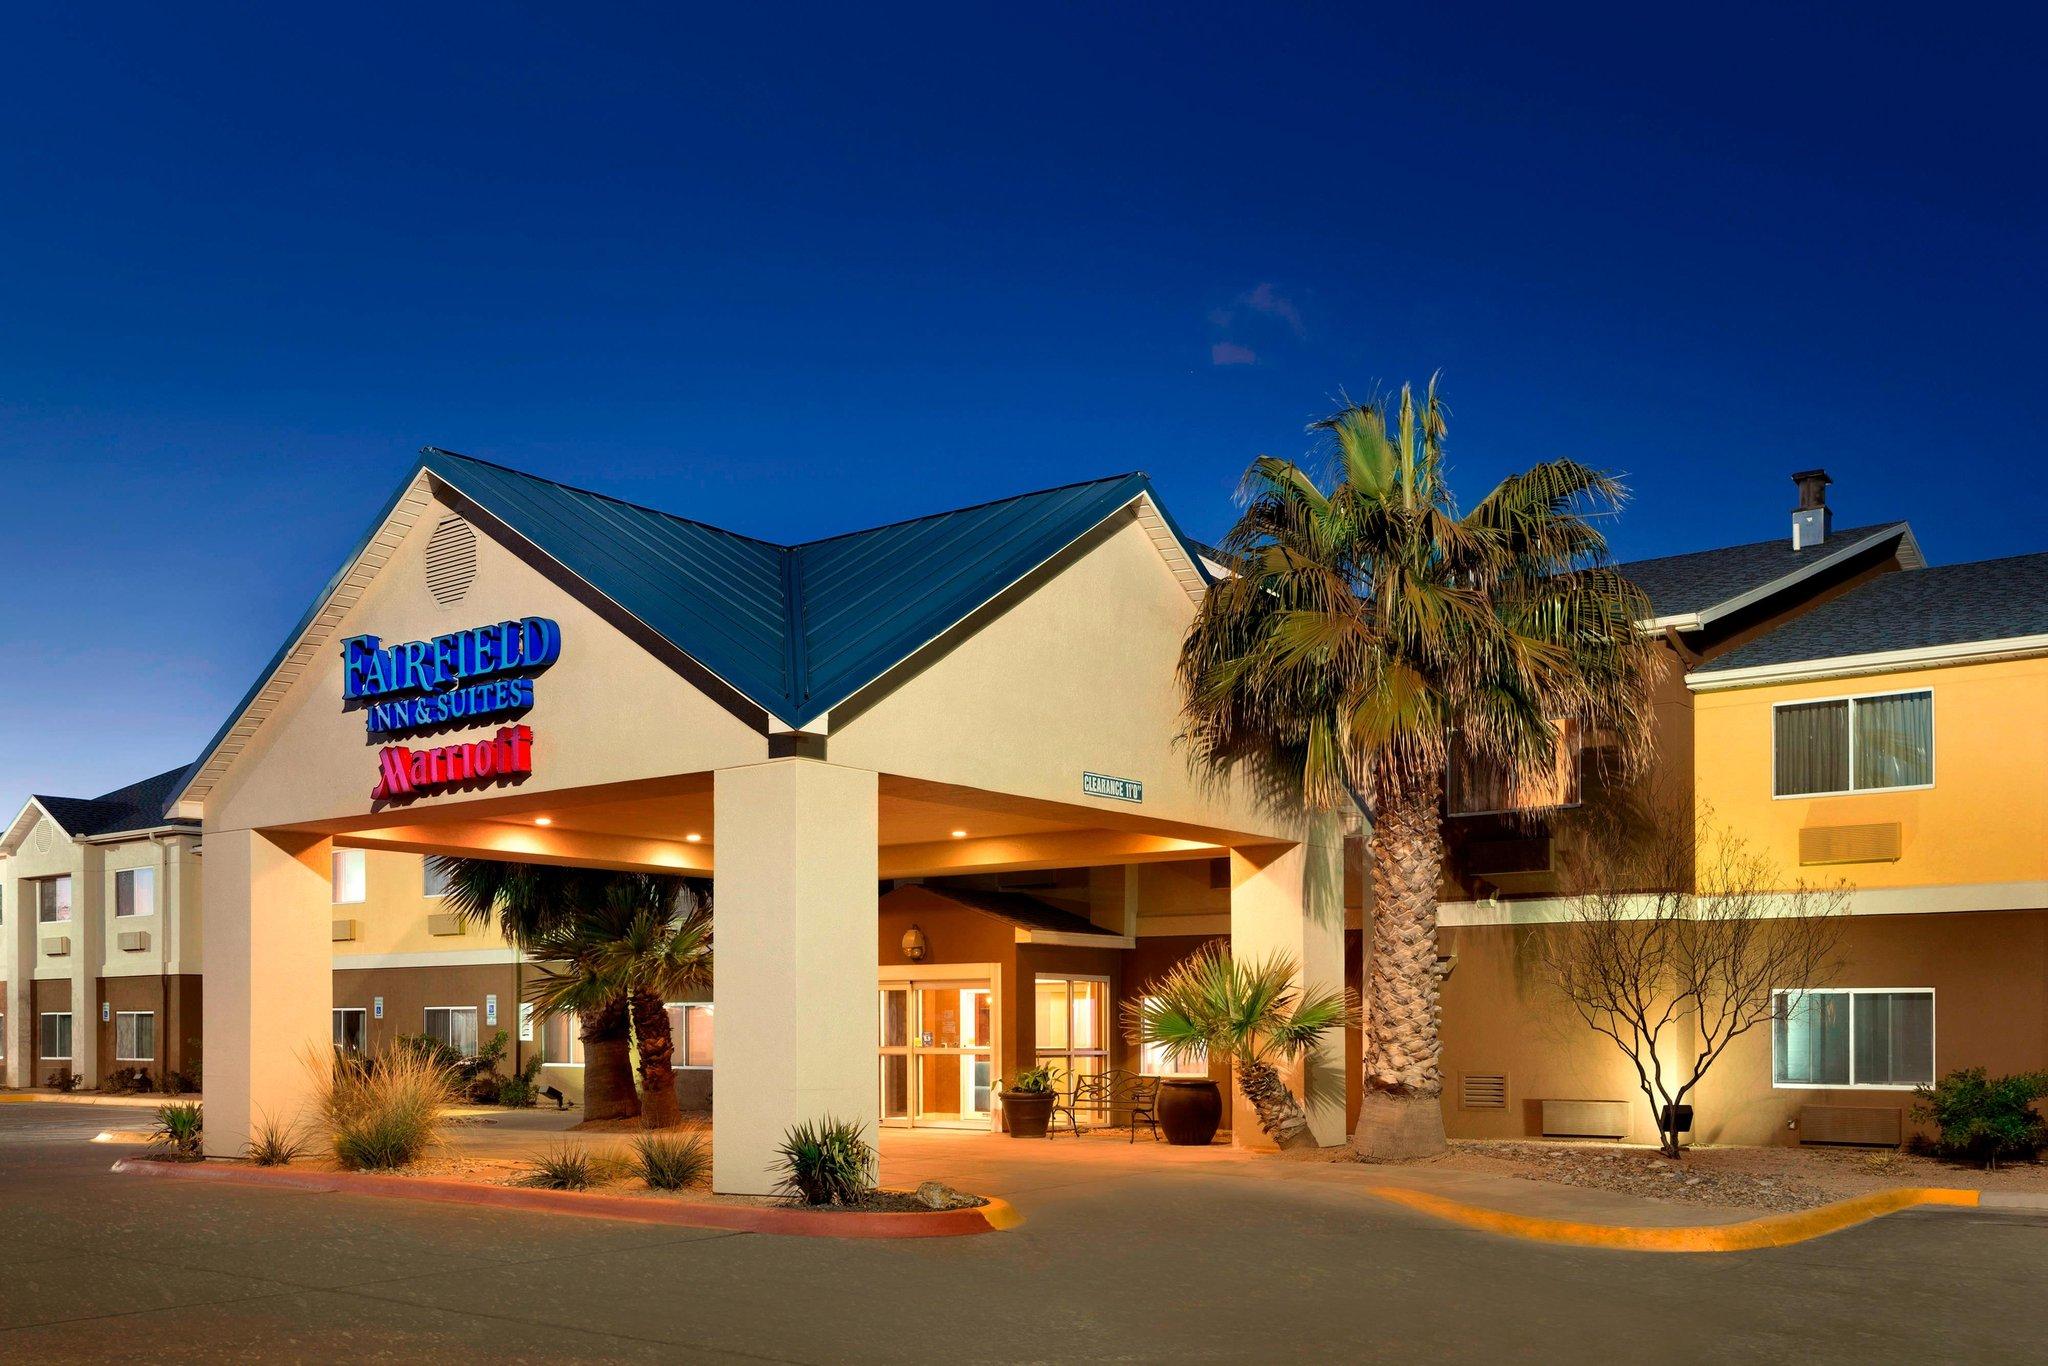 fairfield inn suites midland tourist class midland tx hotels rh travelweekly com